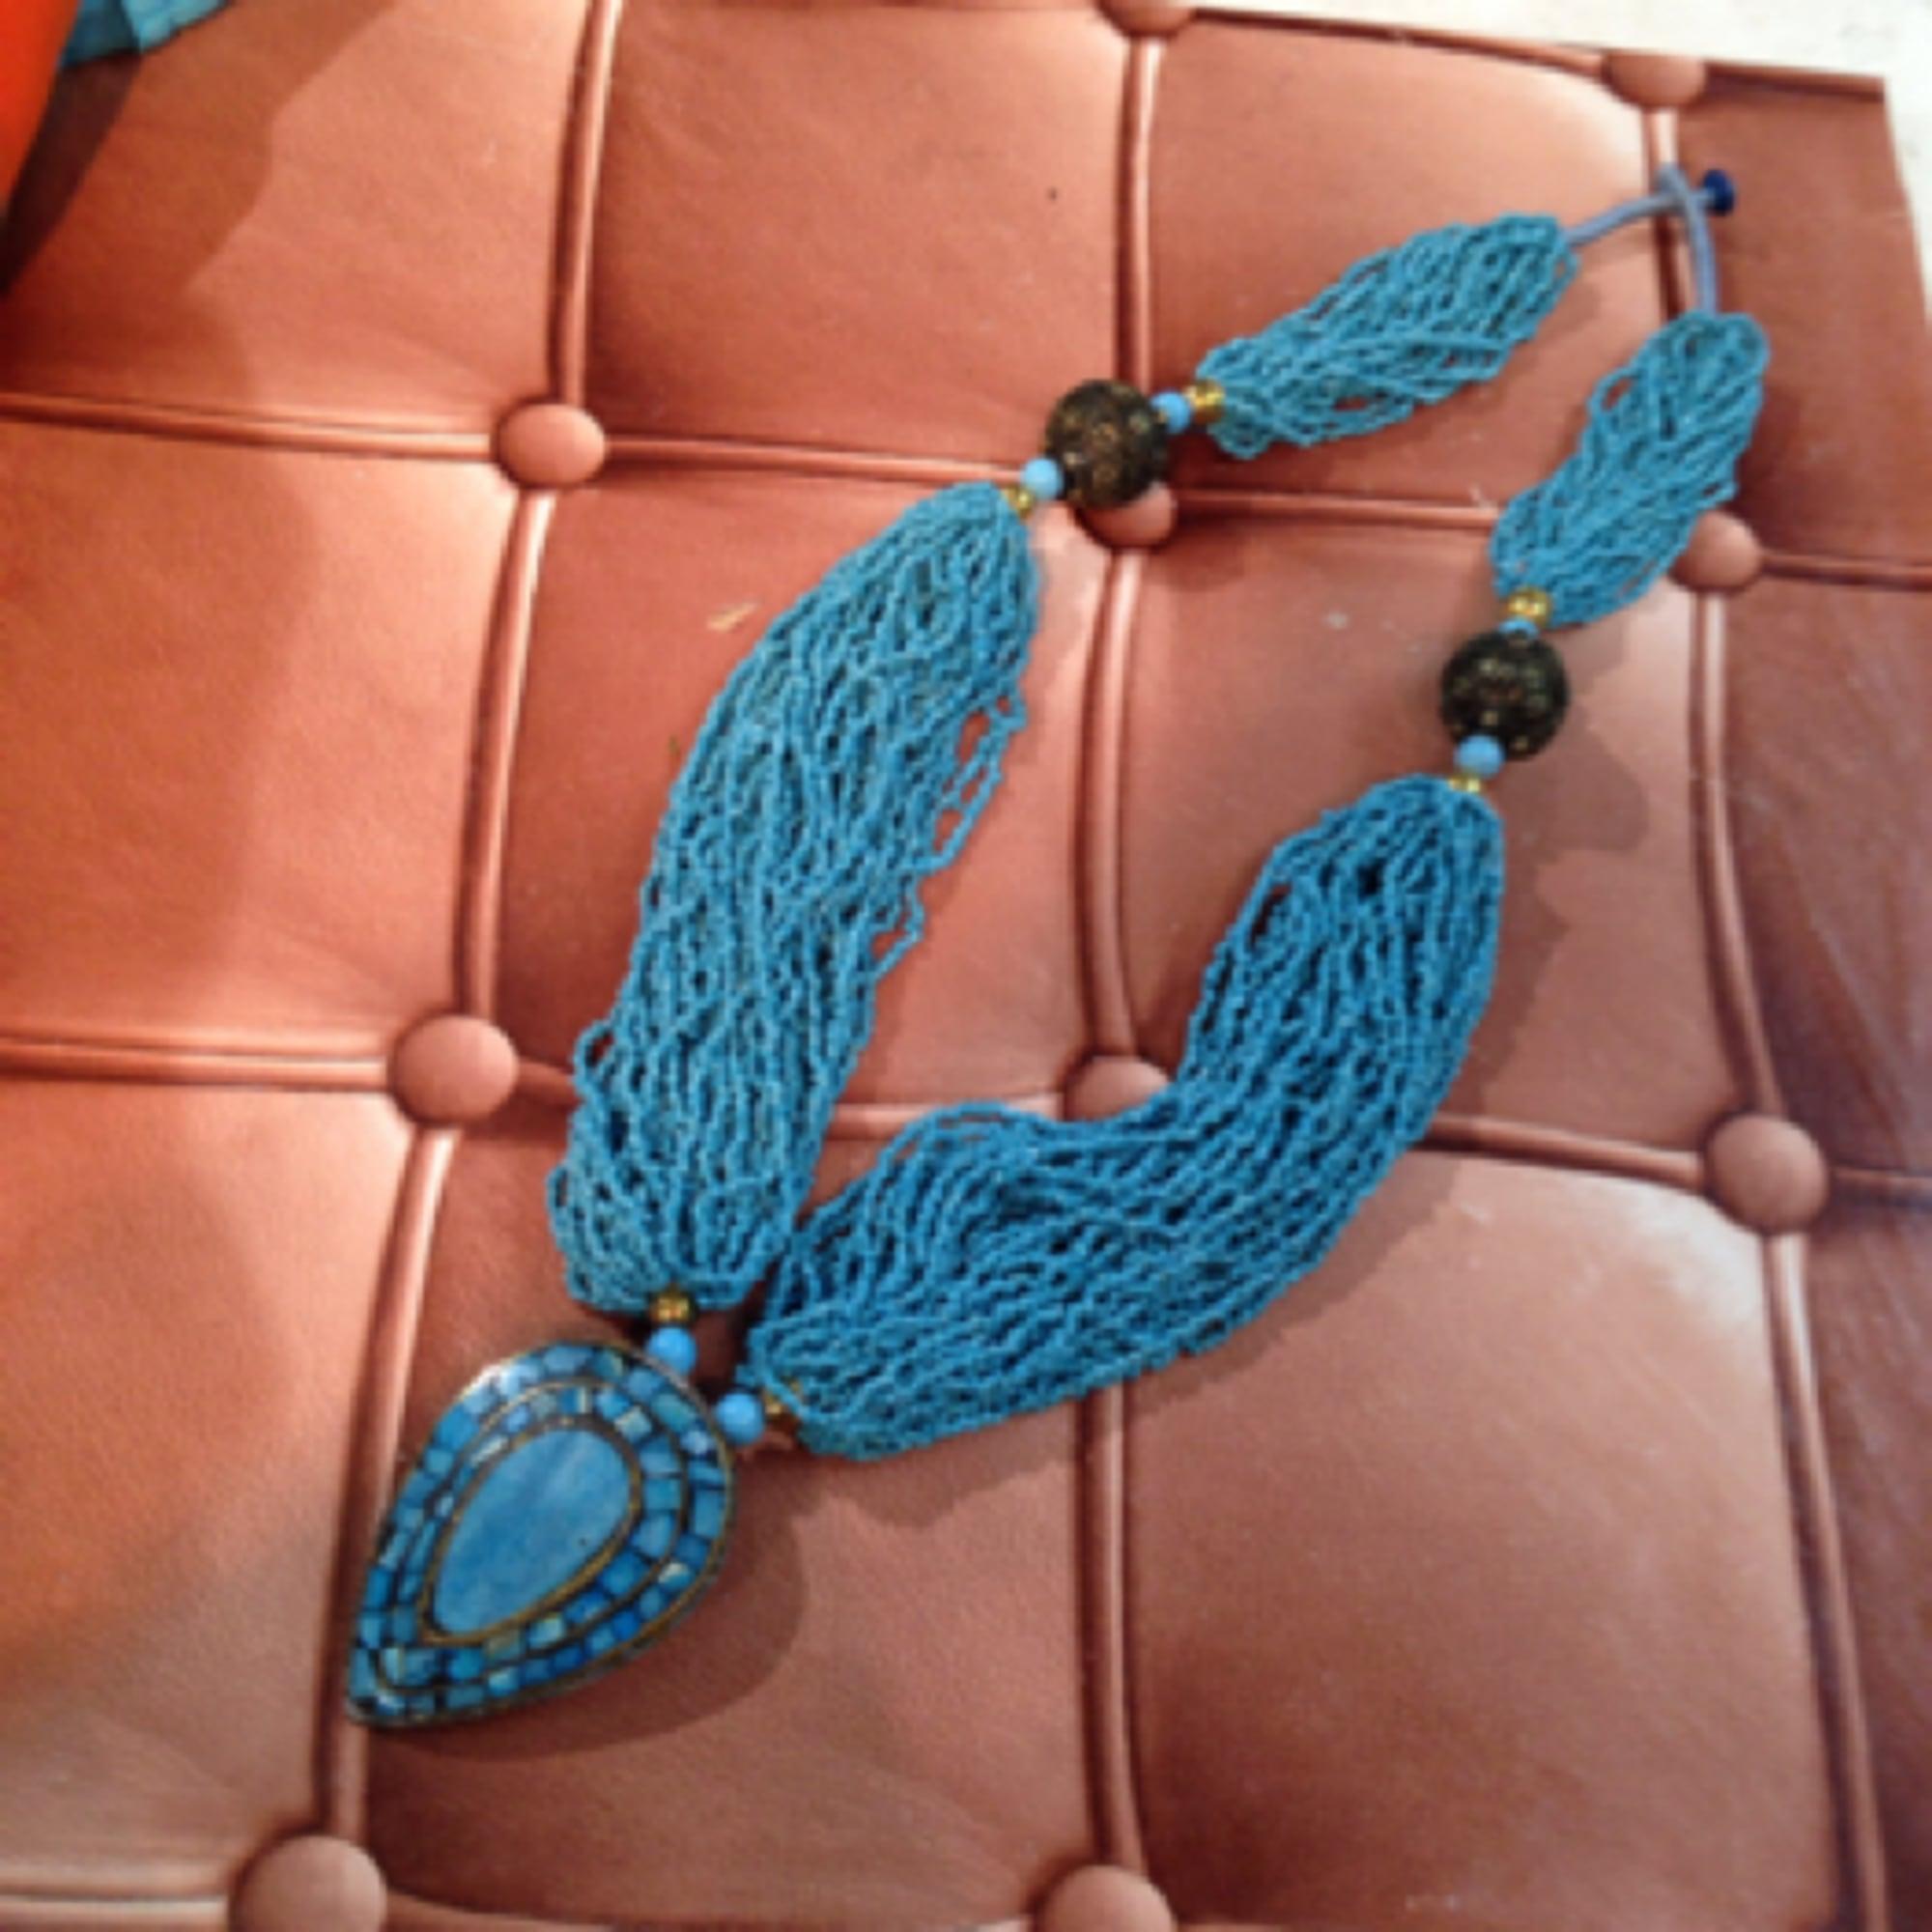 Sautoir MARQUE INCONNUE Bleu, bleu marine, bleu turquoise